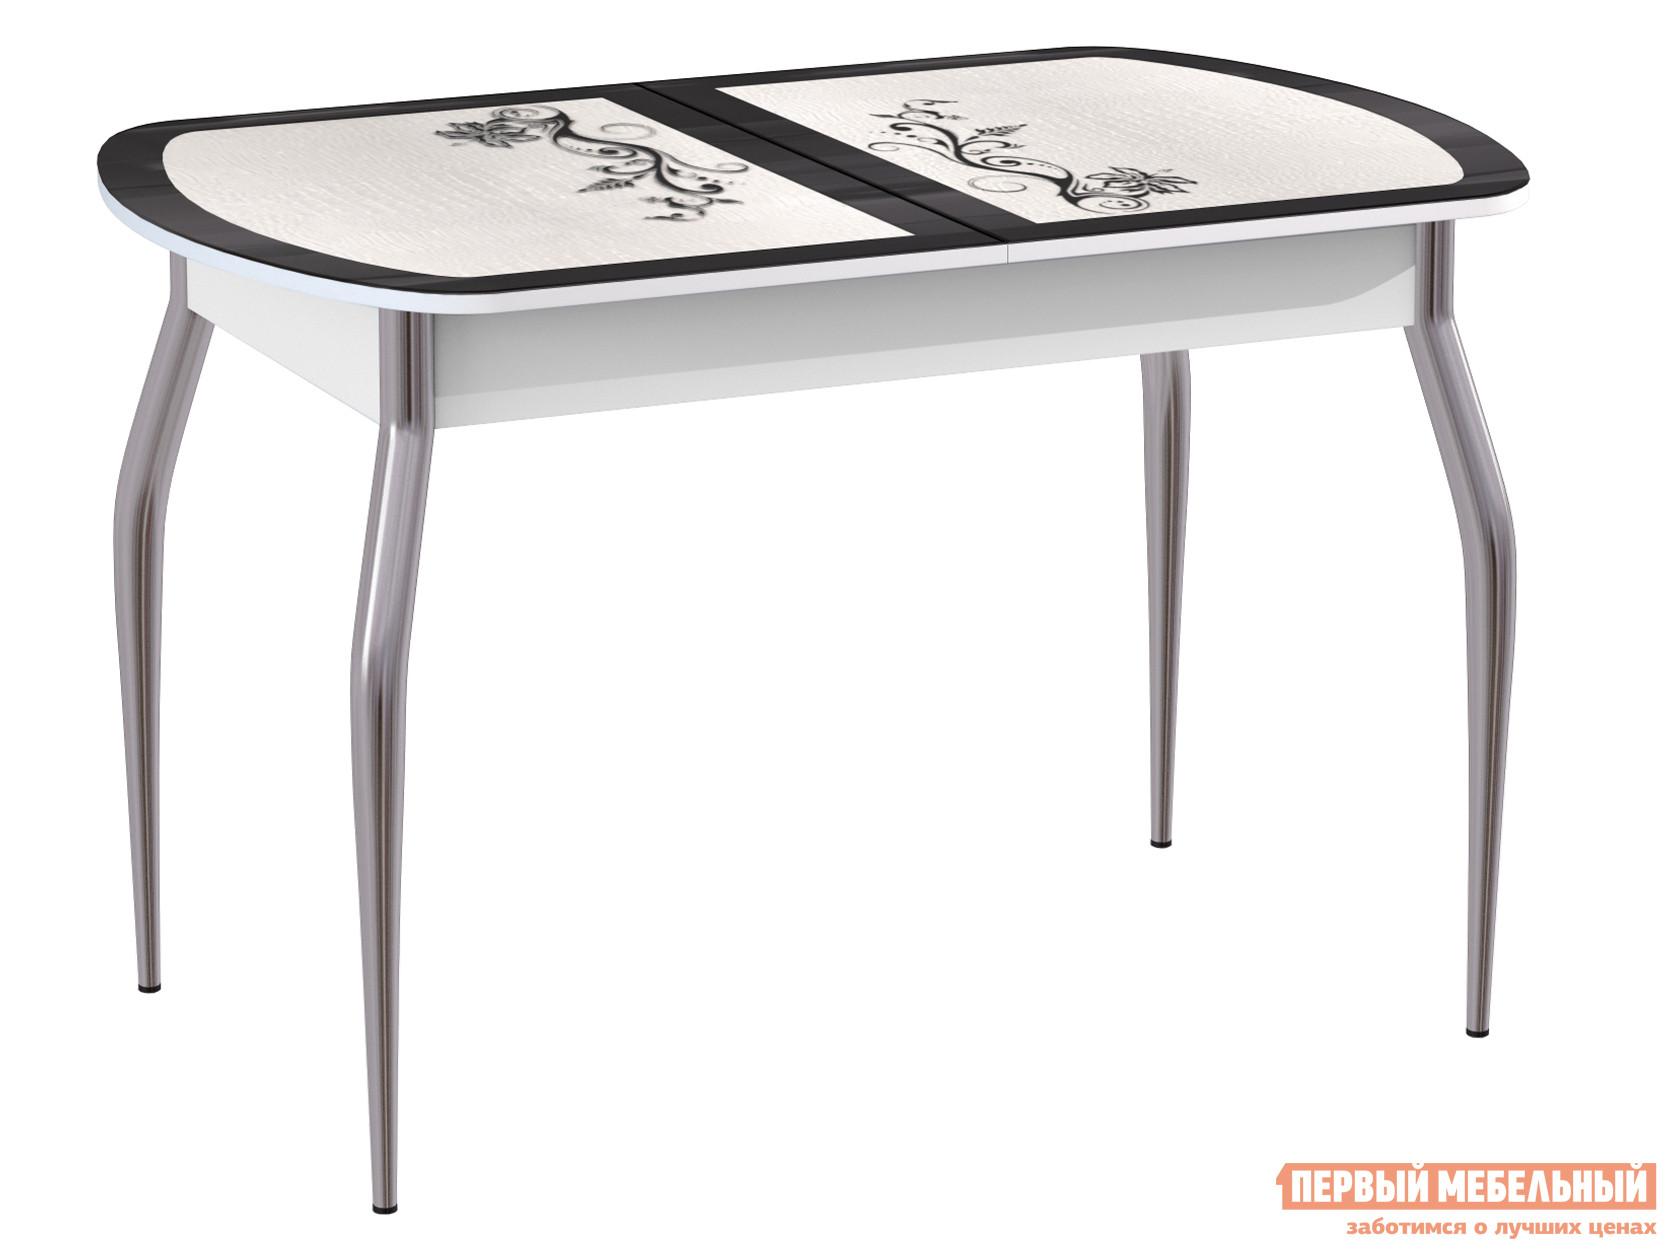 Кухонный стол ДИК Стол Флоренция 110(140)*70*75